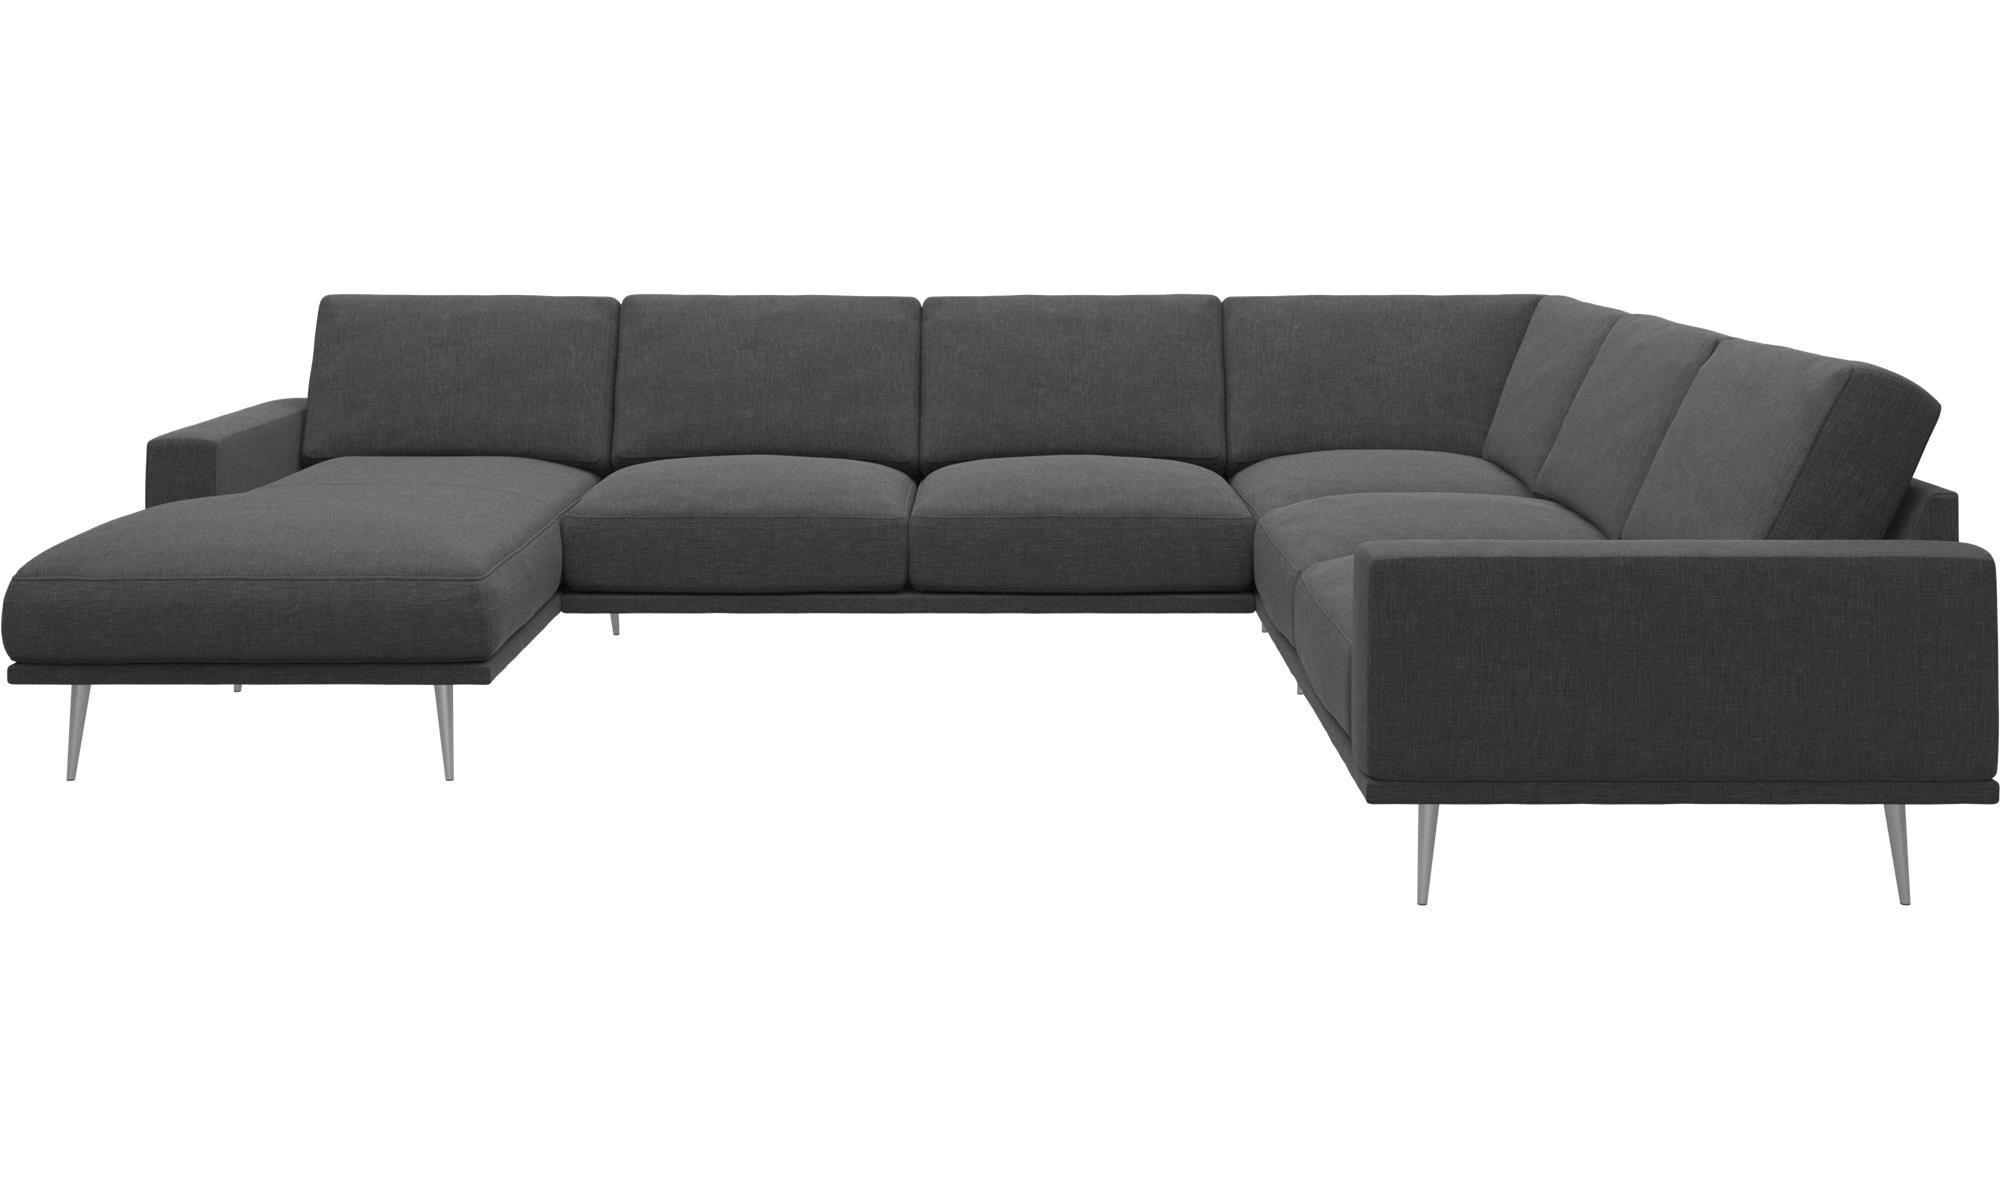 Carlton Corner Sofa With Resting Unit With Images Corner Sofa